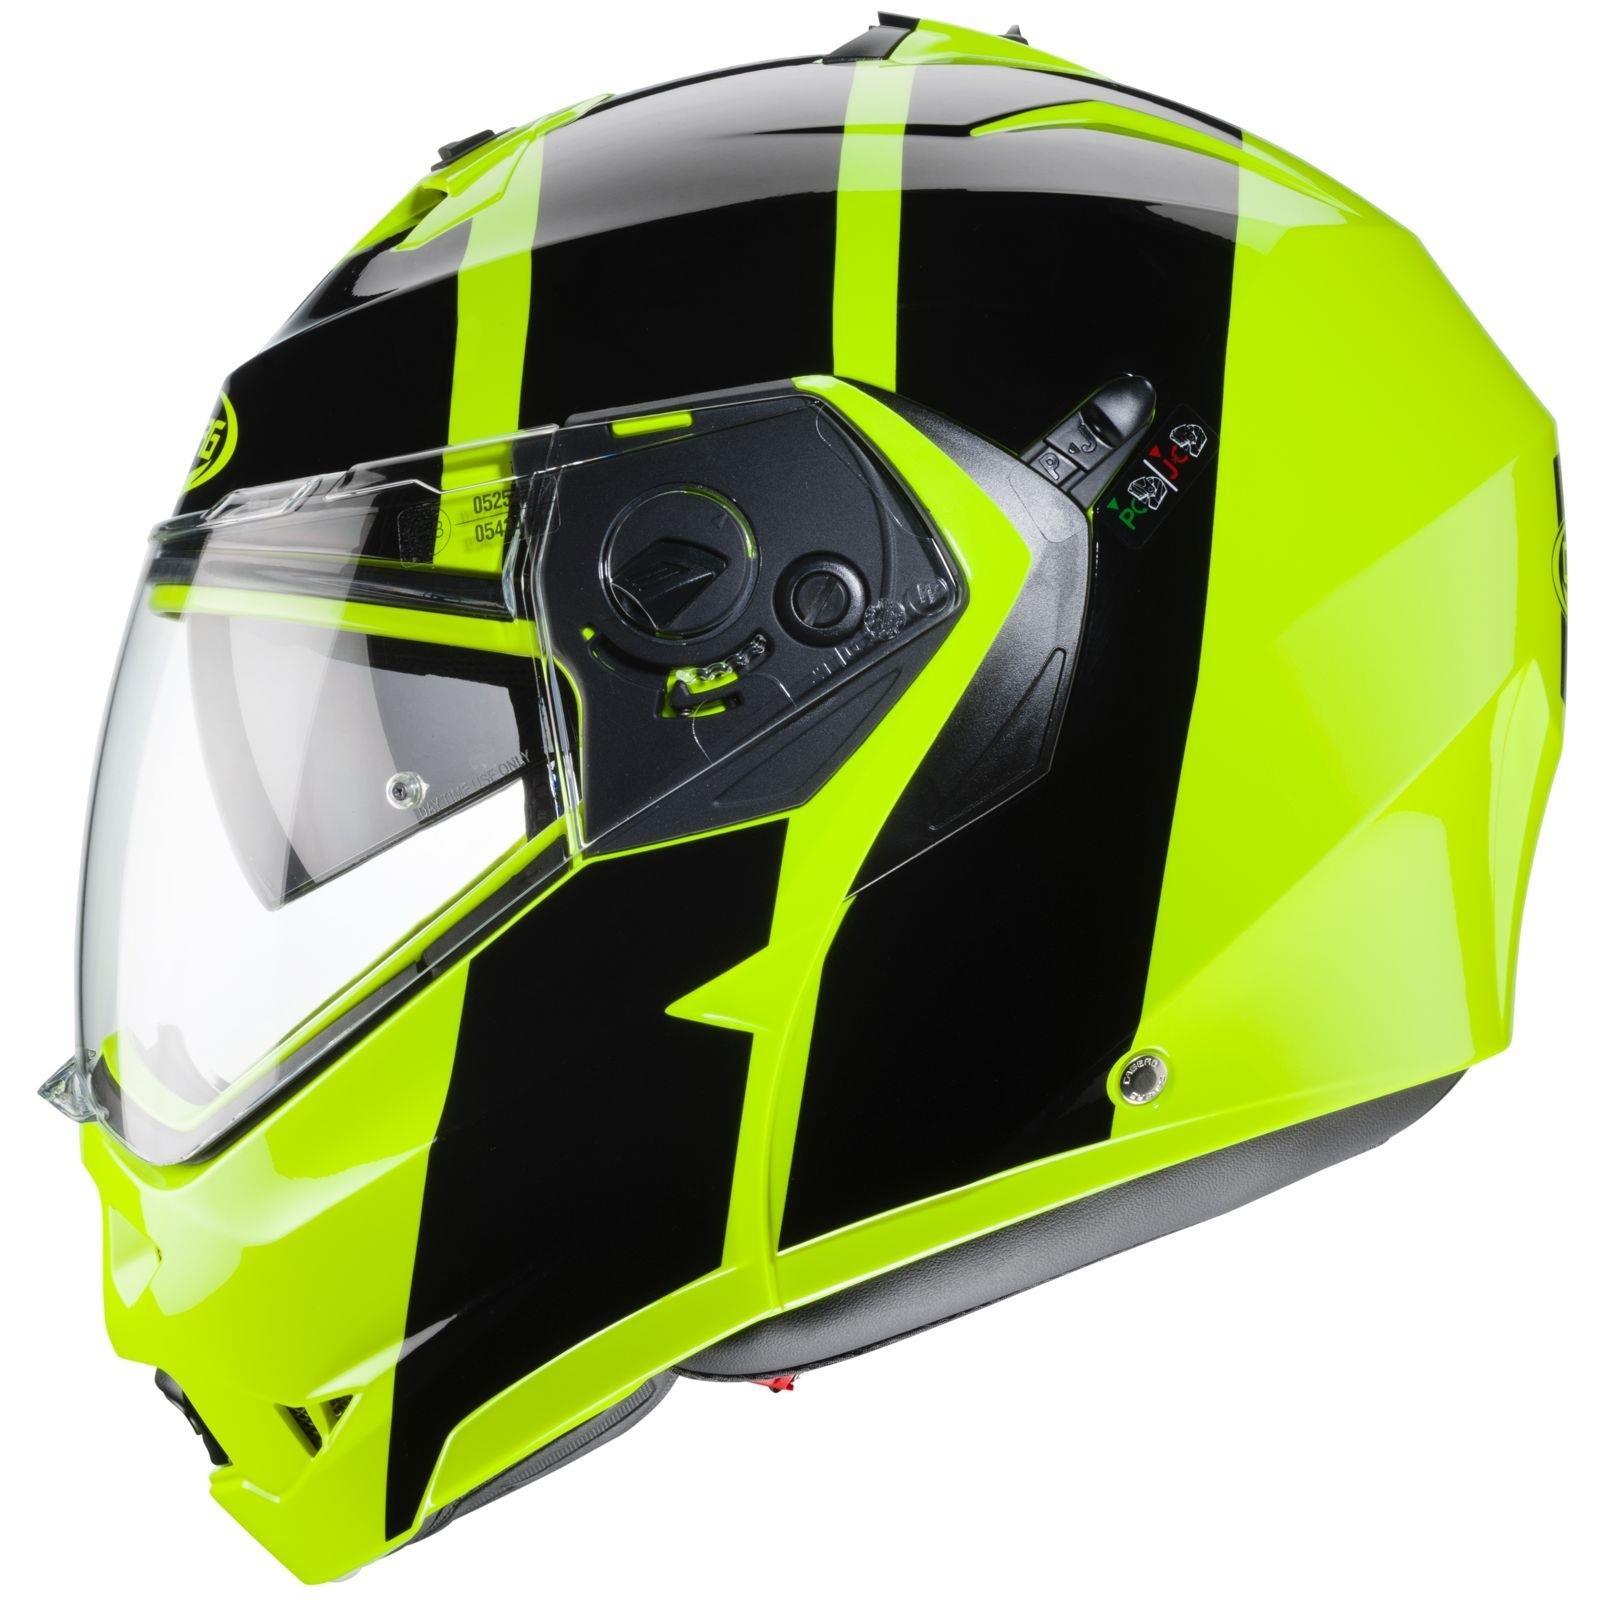 Caberg-Klapp-Helm-Duke-II-2-Motorrad-Belueftet-Sonnenblende-Pinlock-Visier-Jet Indexbild 37